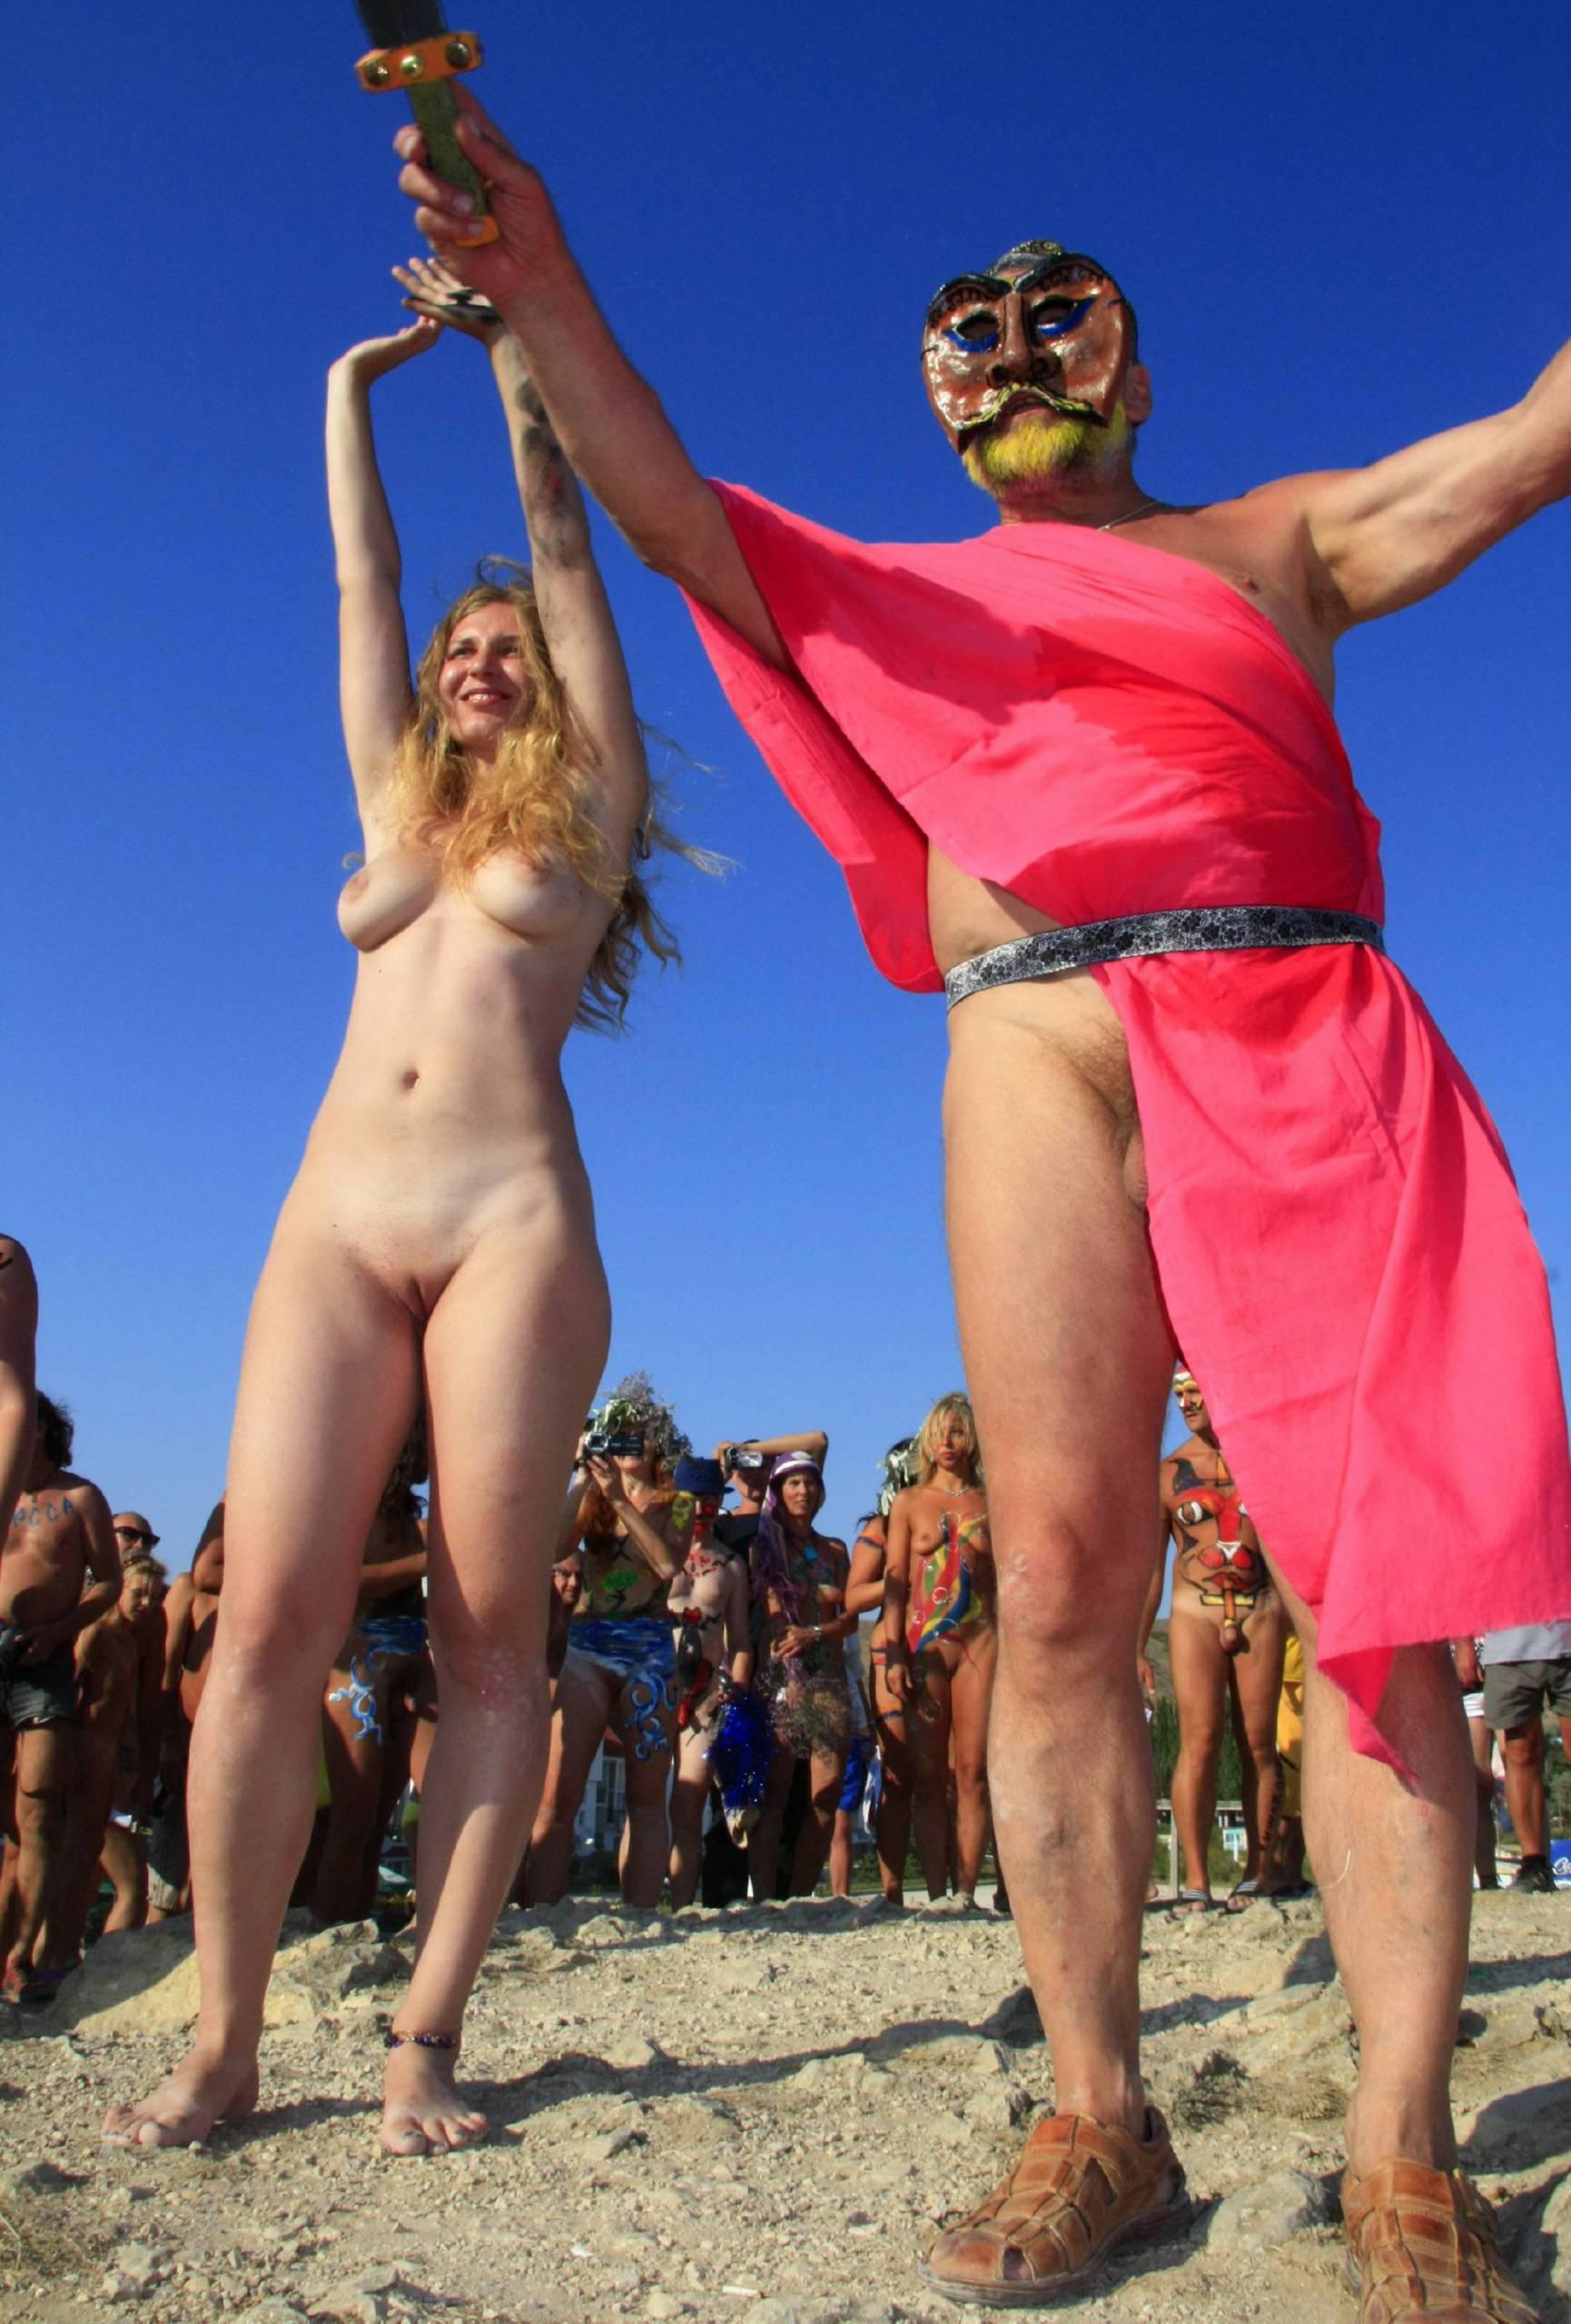 Pure Nudism Photos Blue Sky Group Line-Up - 1